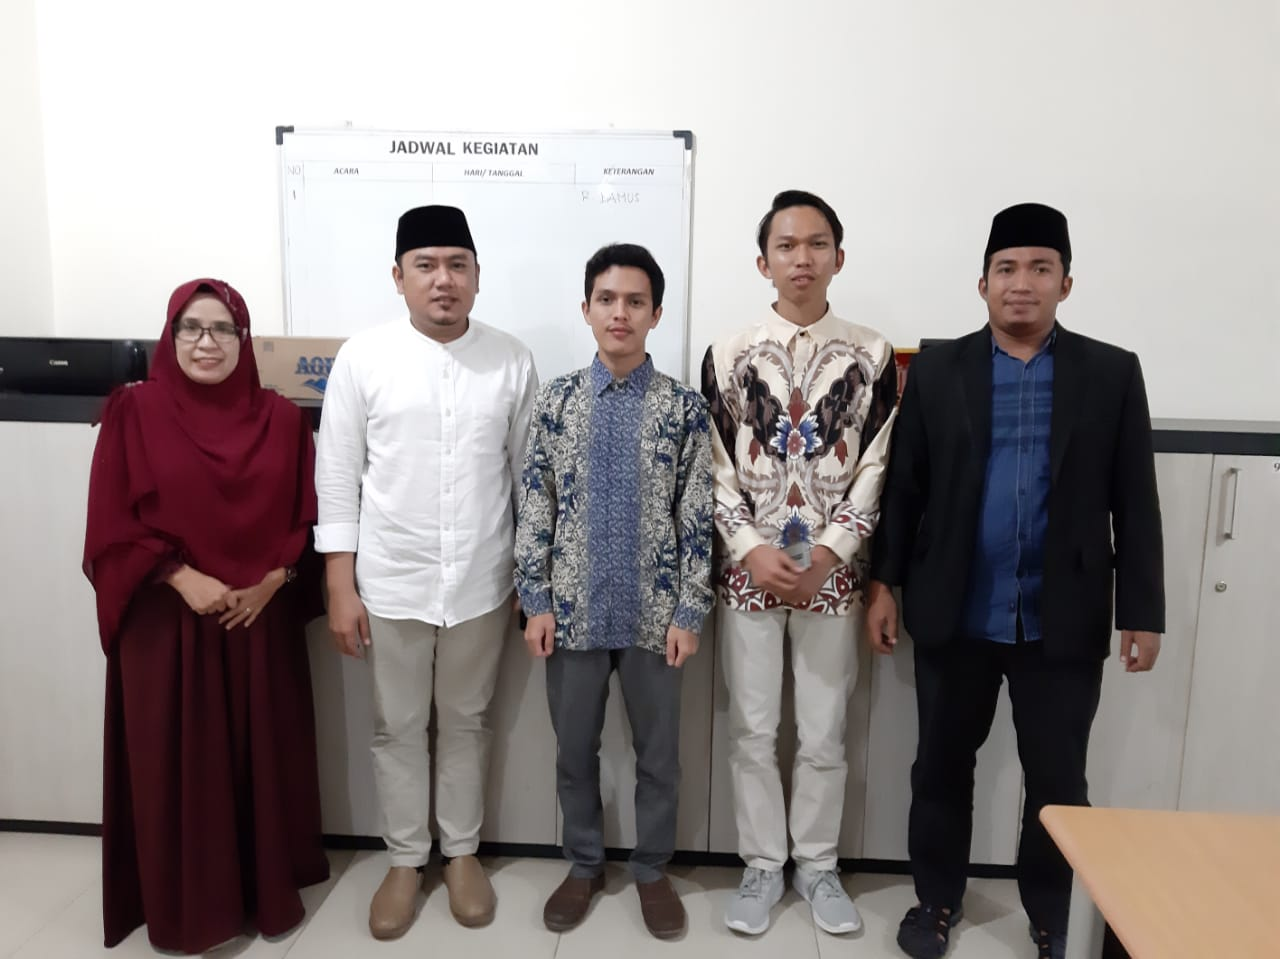 Fraksi PKS Inhu Terima Kunjungan Alumni Pondok Pesantren Khairul Ummah